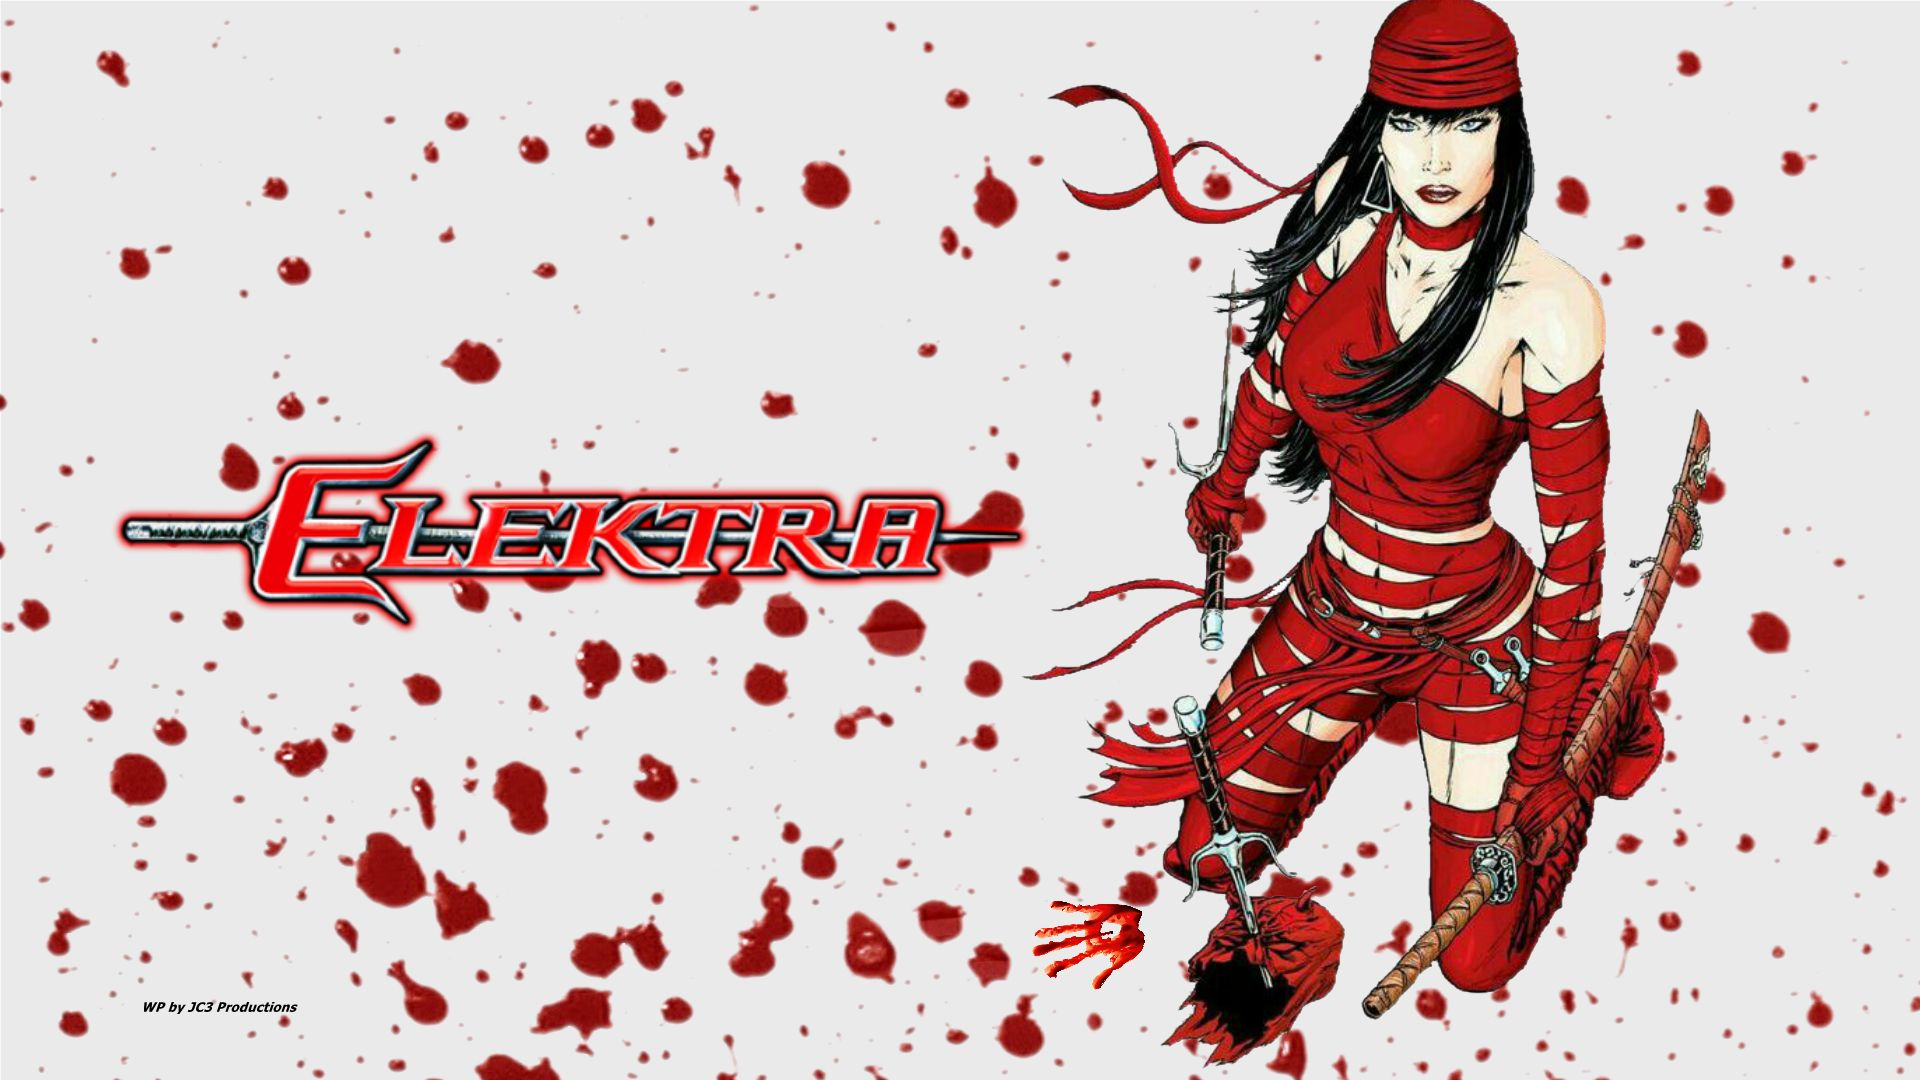 Elektra vs Daredevil wallpaper by Curtdawg53